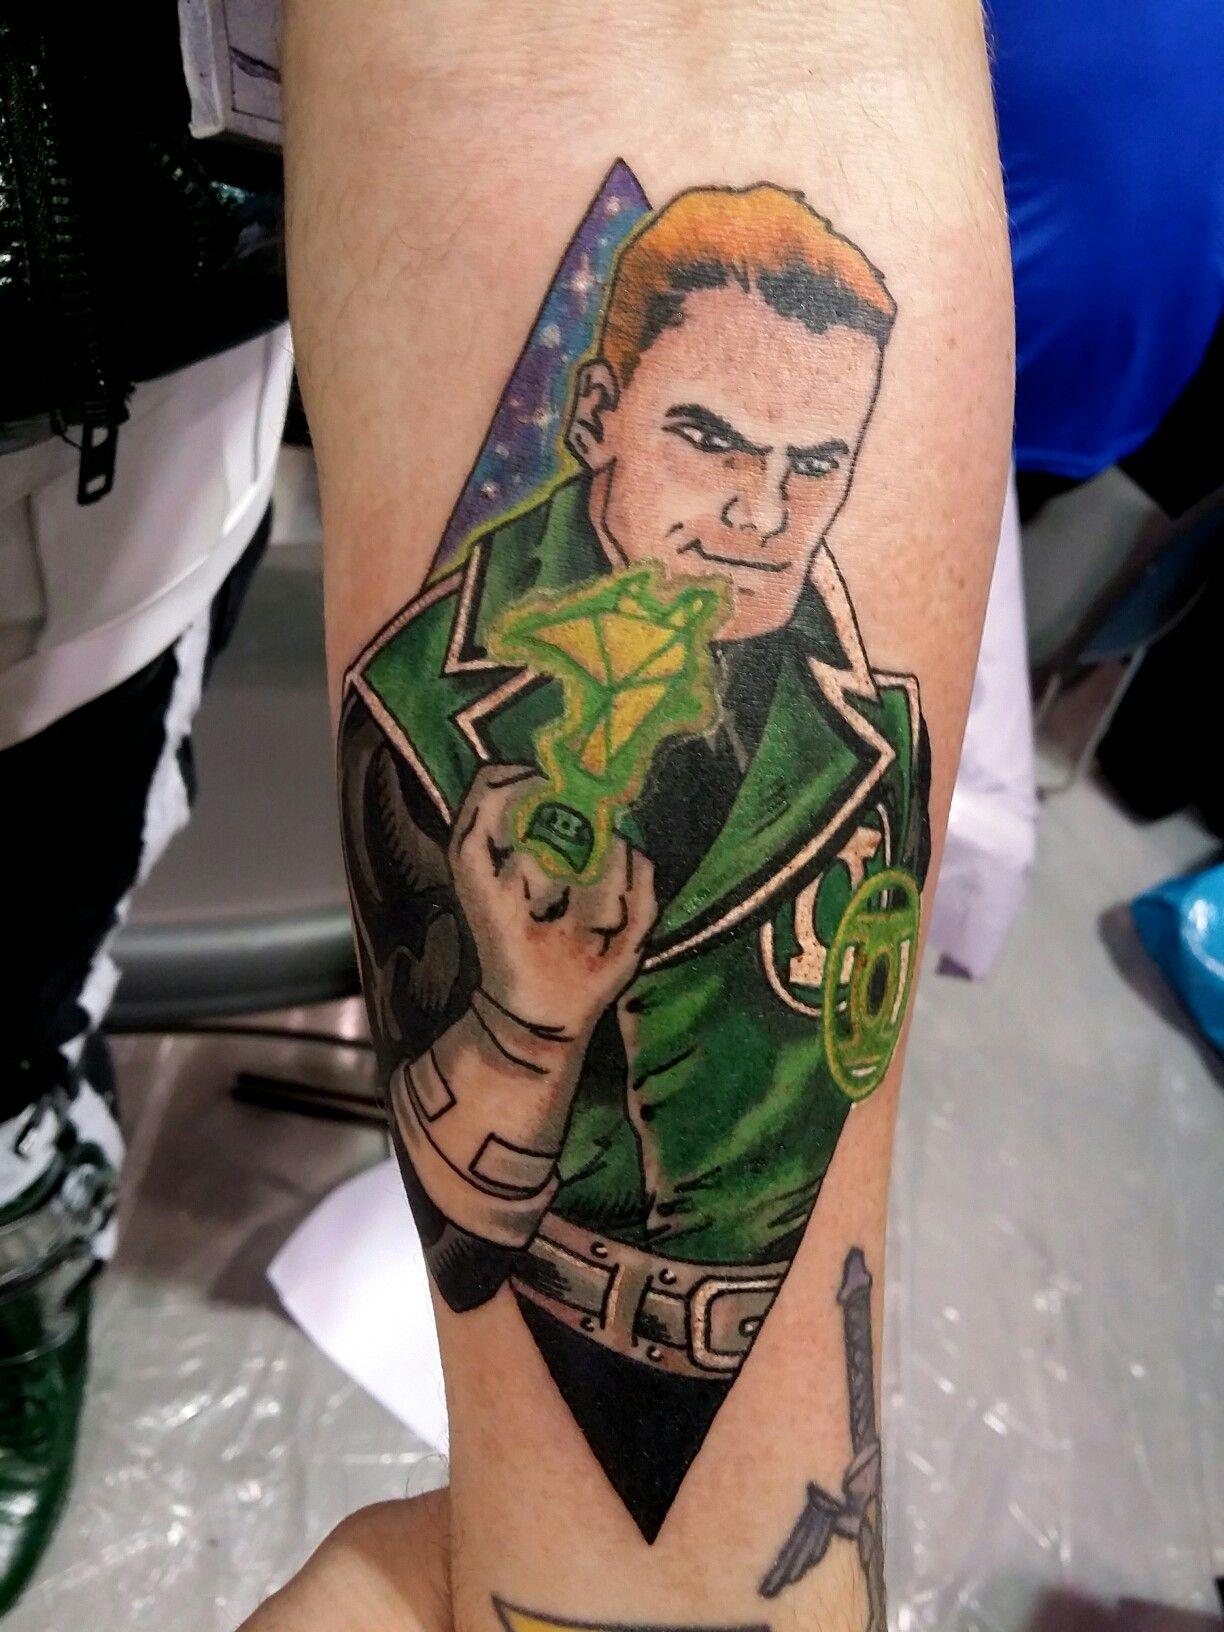 Las vegas tattoo pictures images photos photobucket - Tattoo